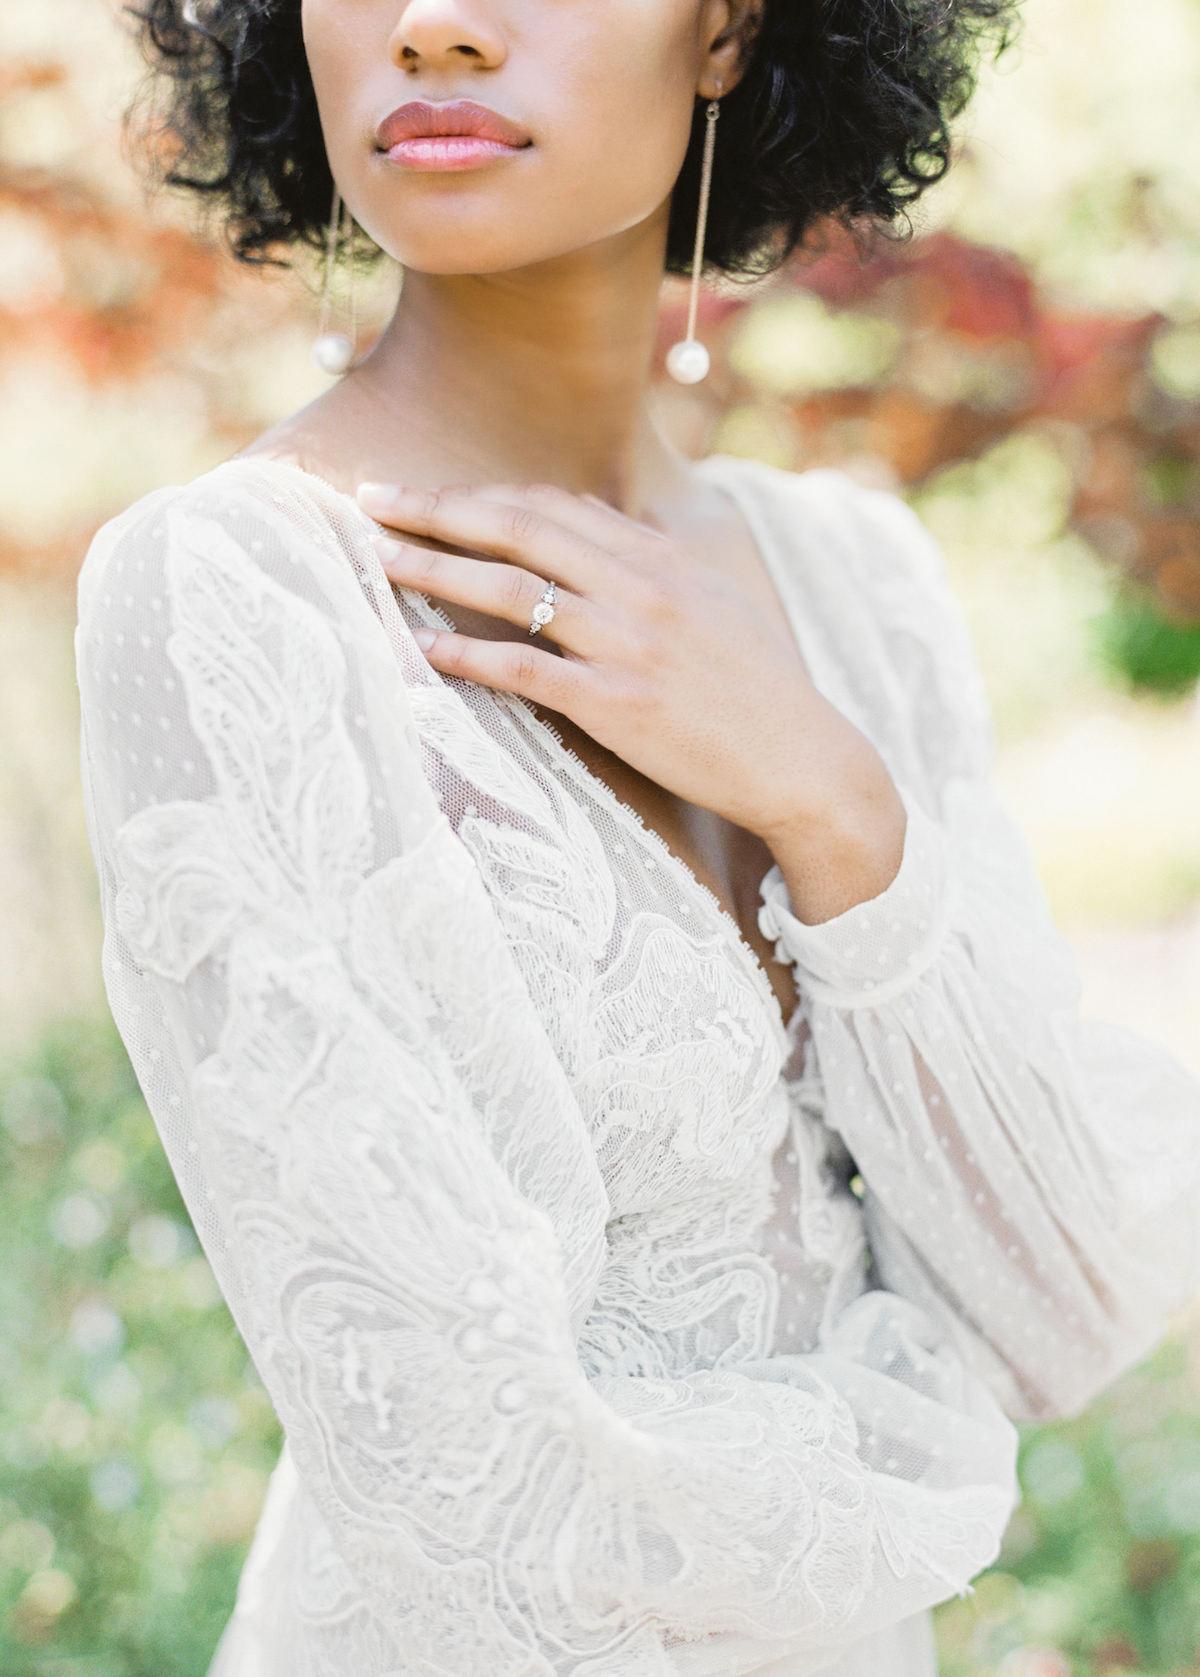 Ashley-Rae-Studio-Fine-Art-Wedding-Photographer-San-Luis-Obispo102.jpg